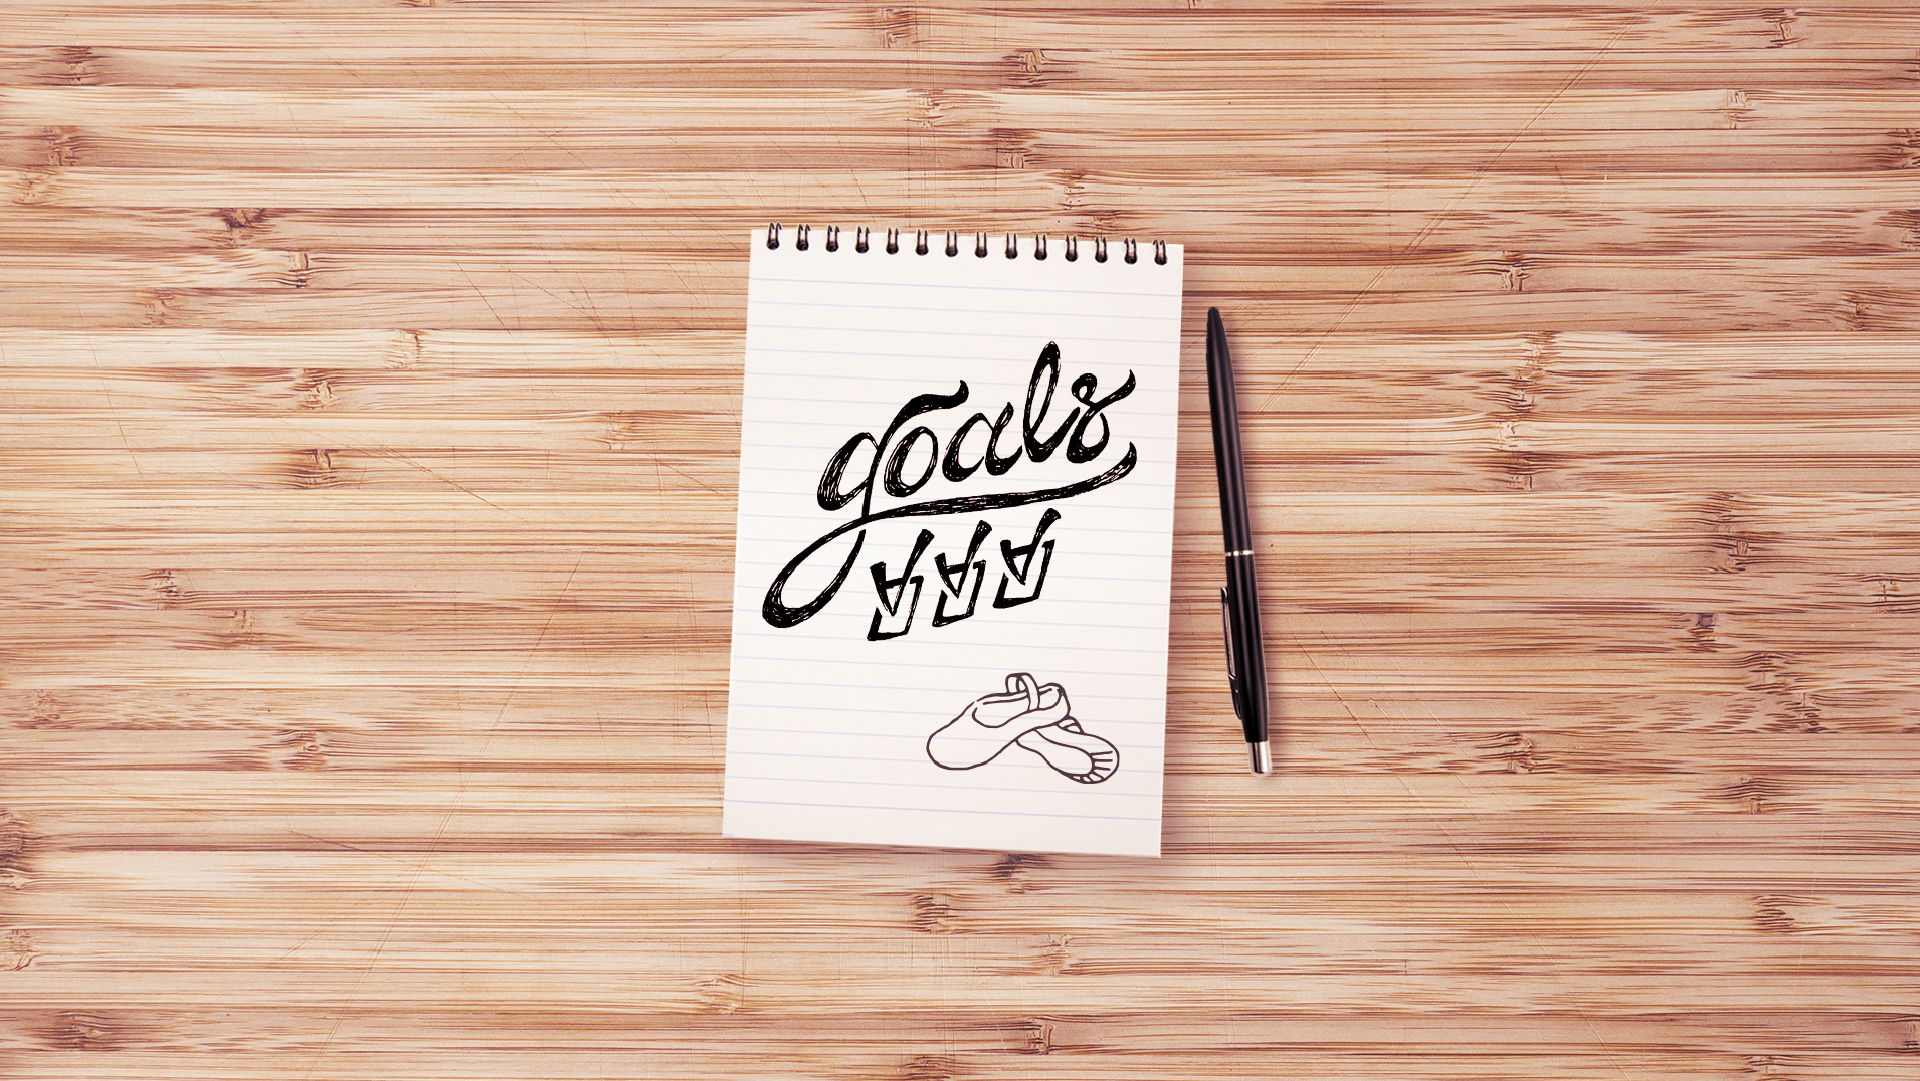 Discover Goals